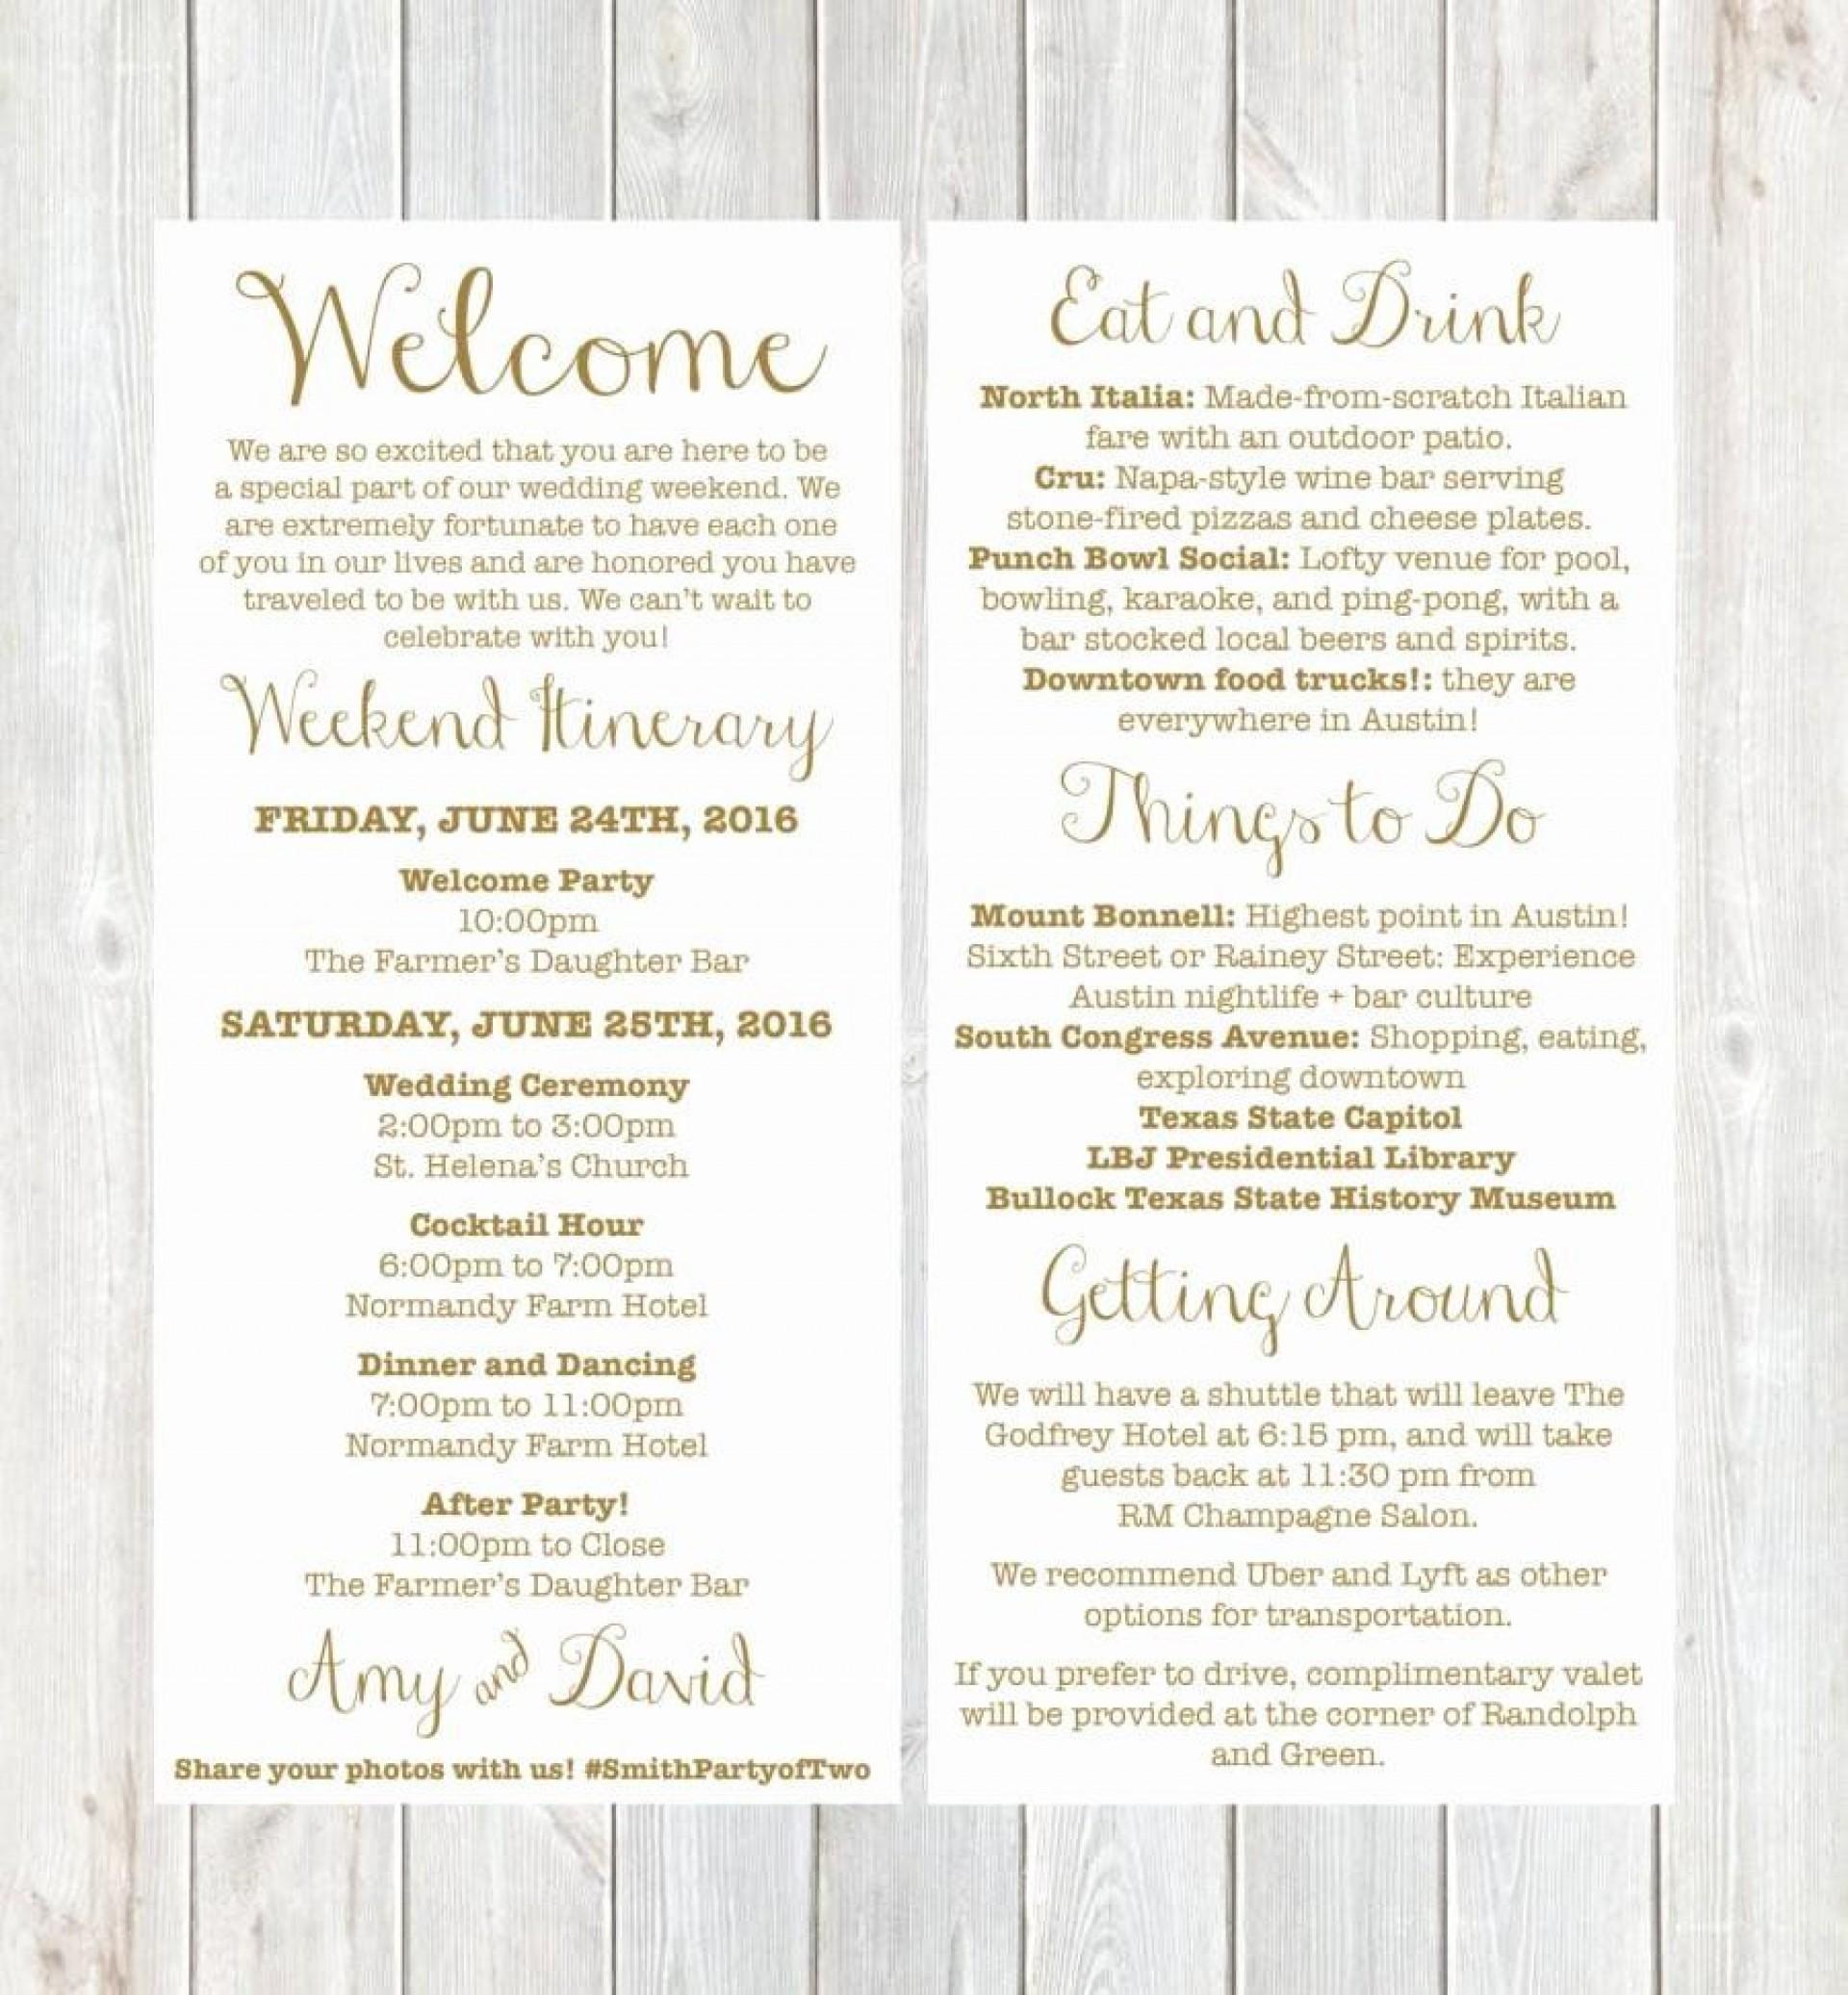 003 Best Free Destination Wedding Welcome Letter Template High Resolution 1920